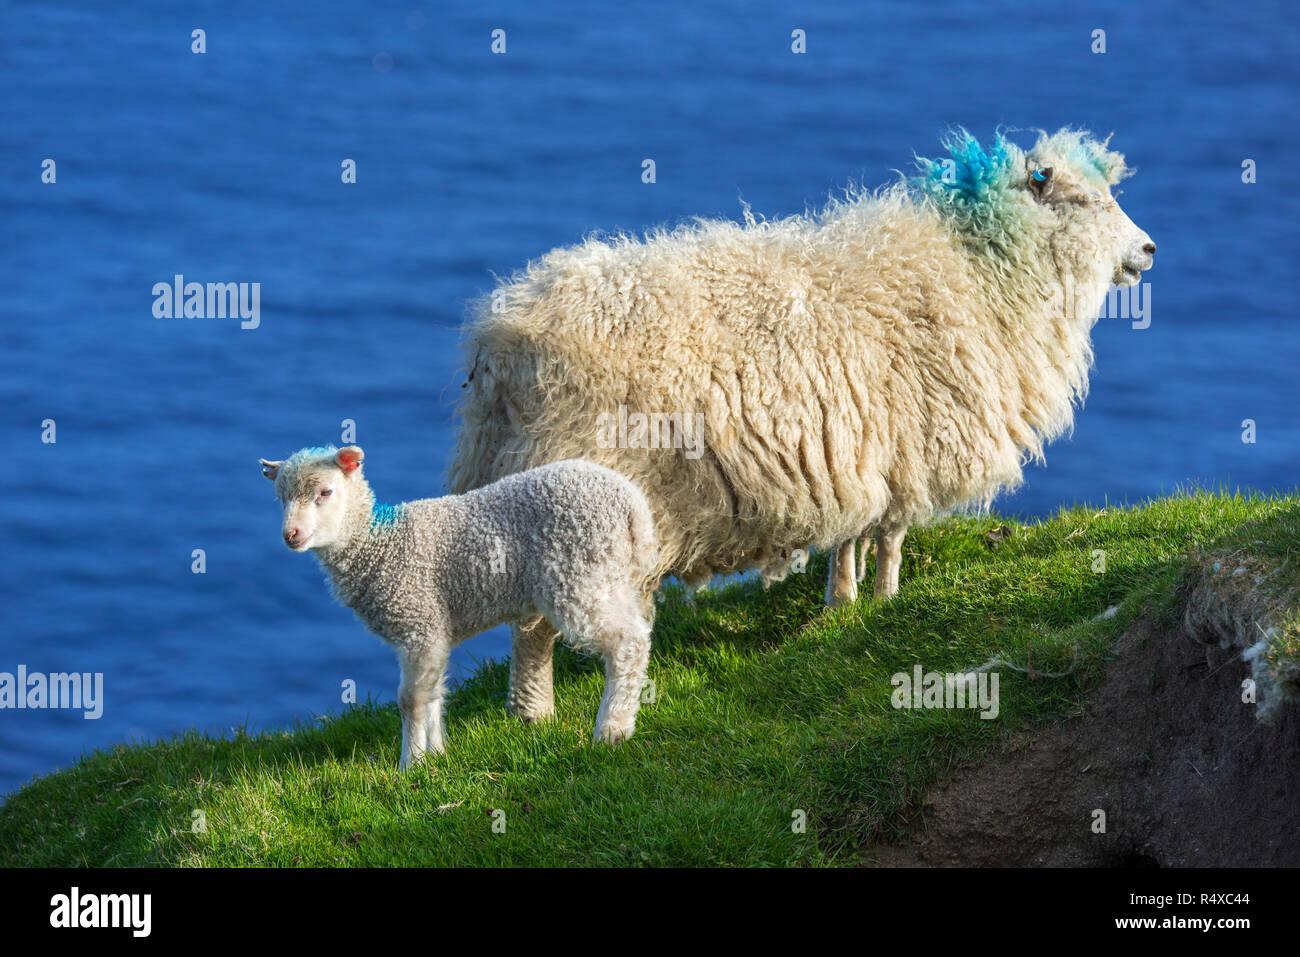 White sheep ewe and lamb on sea cliff top along the Scottish coast in Scotland, UK - Stock Image